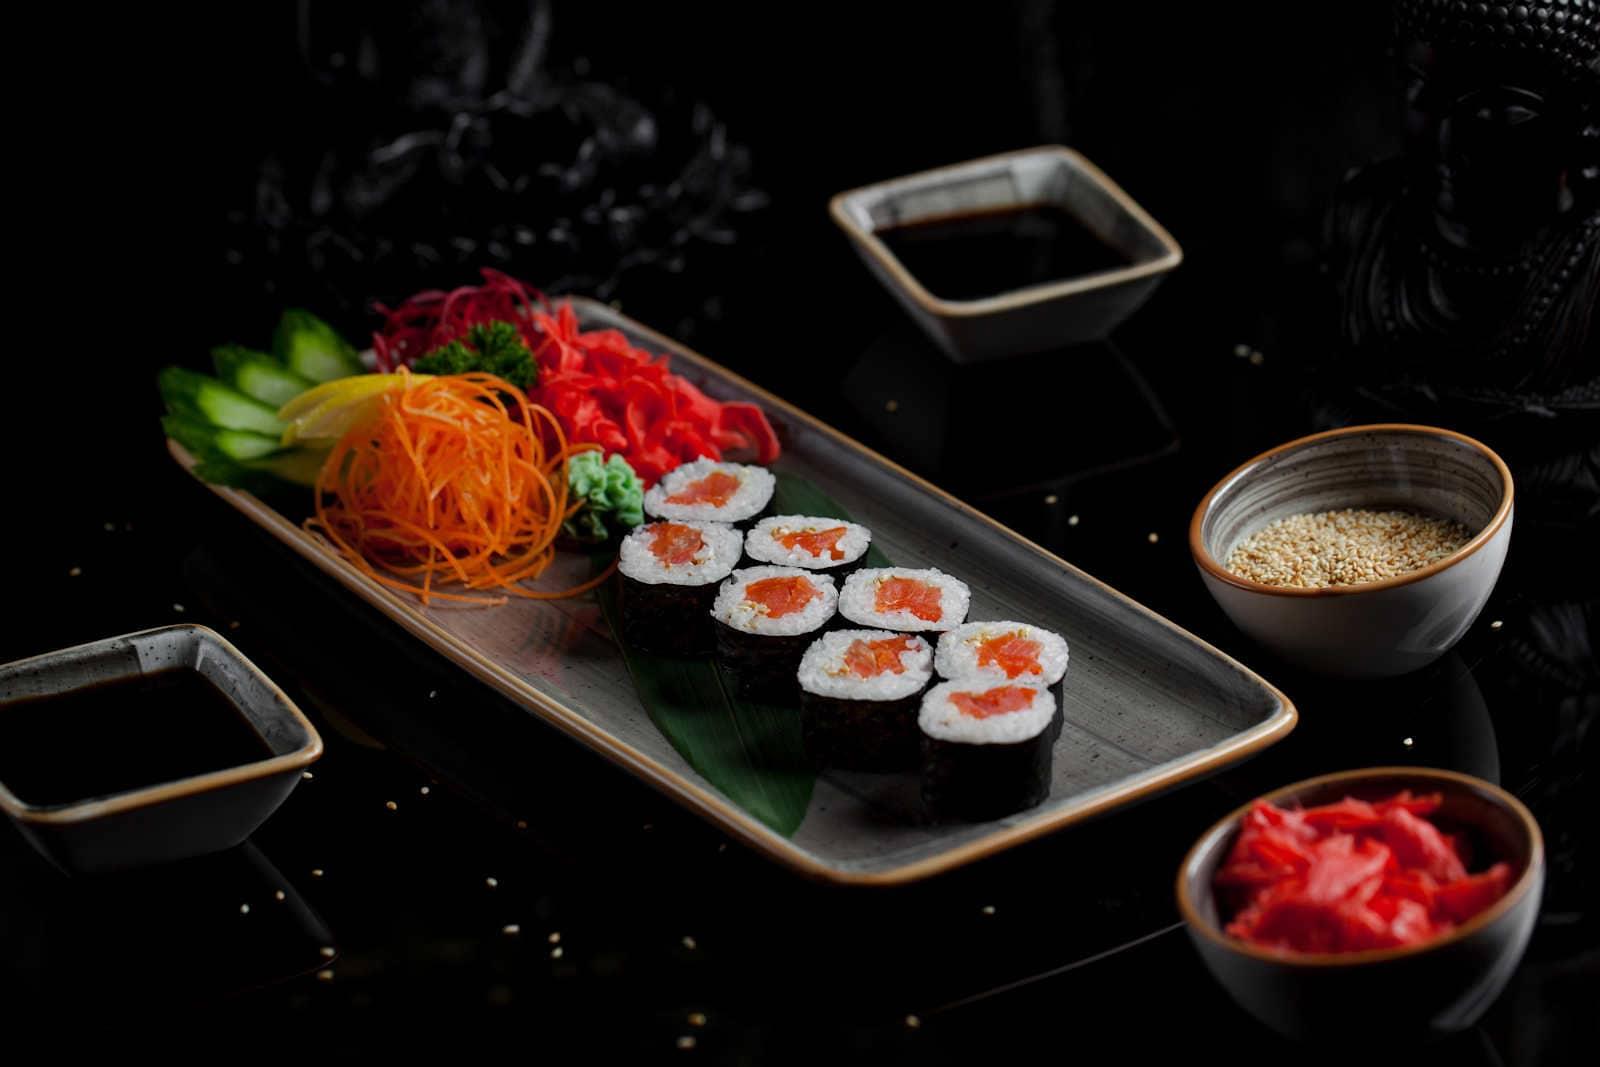 Nara Hibachi Hot Rocks & Sushi of West Bloomfield Township